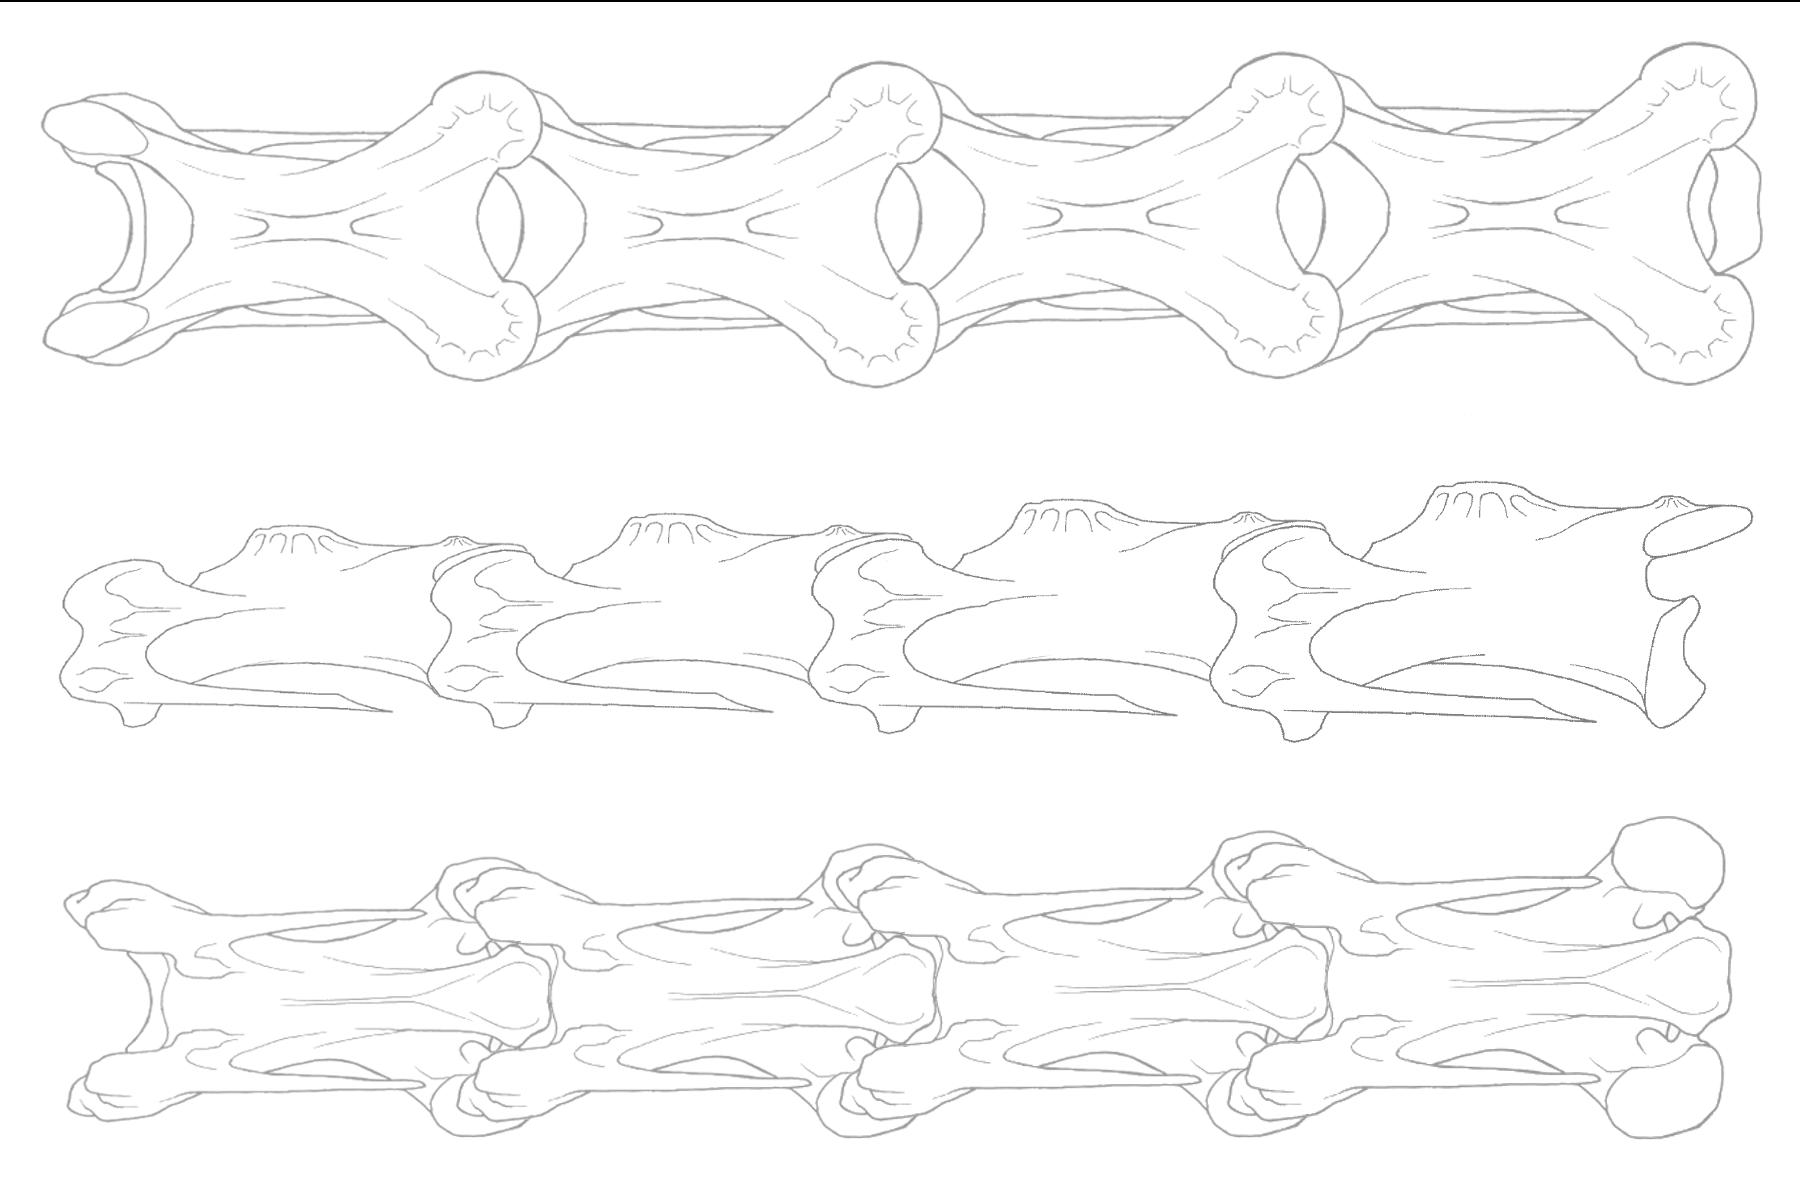 bird neck note sheet - LEFT - all three views